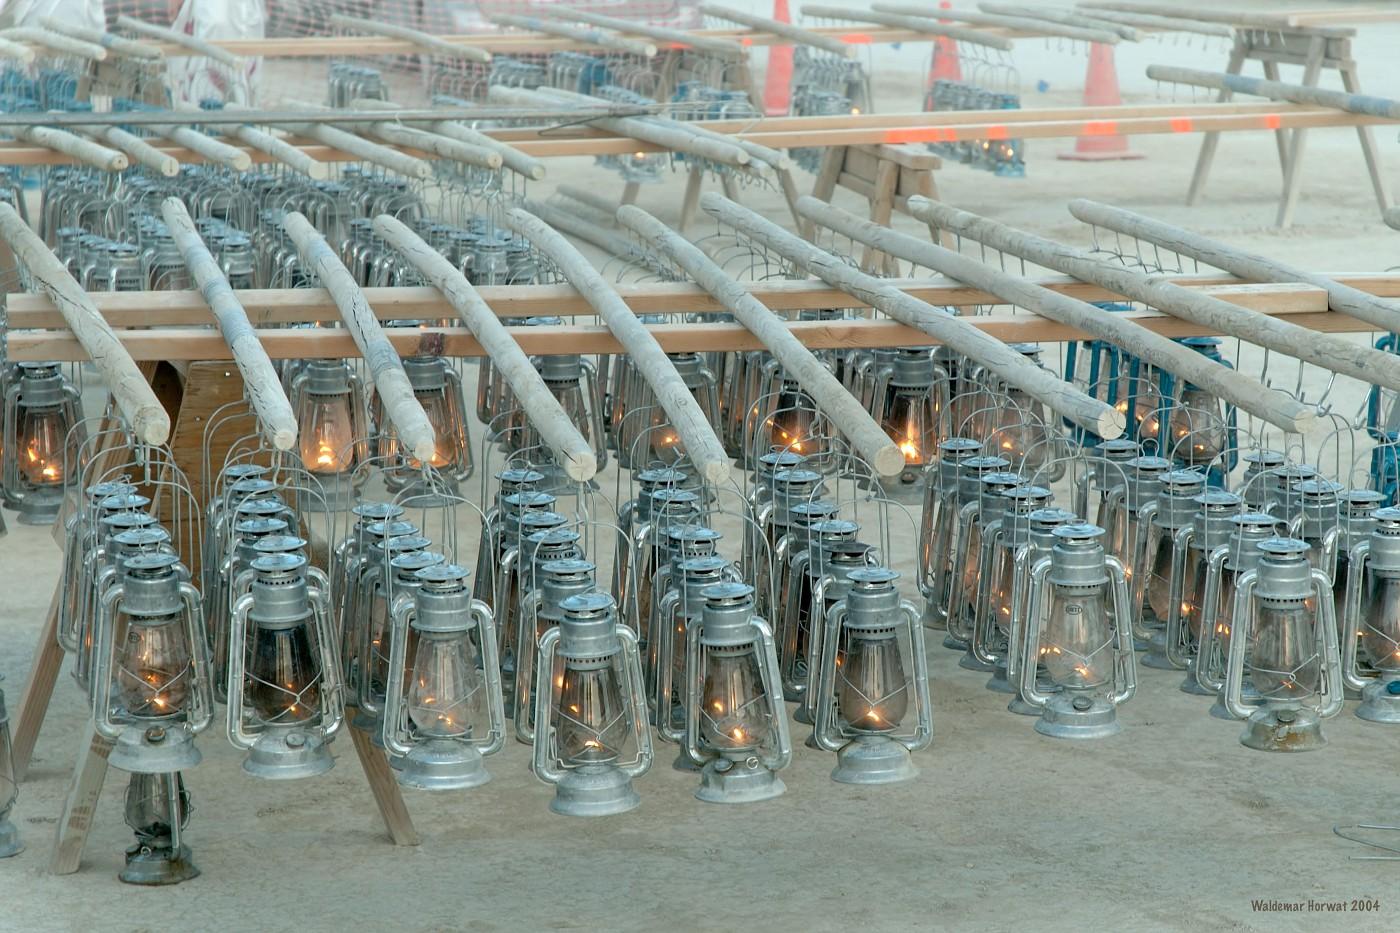 Lamplighters' Lamps